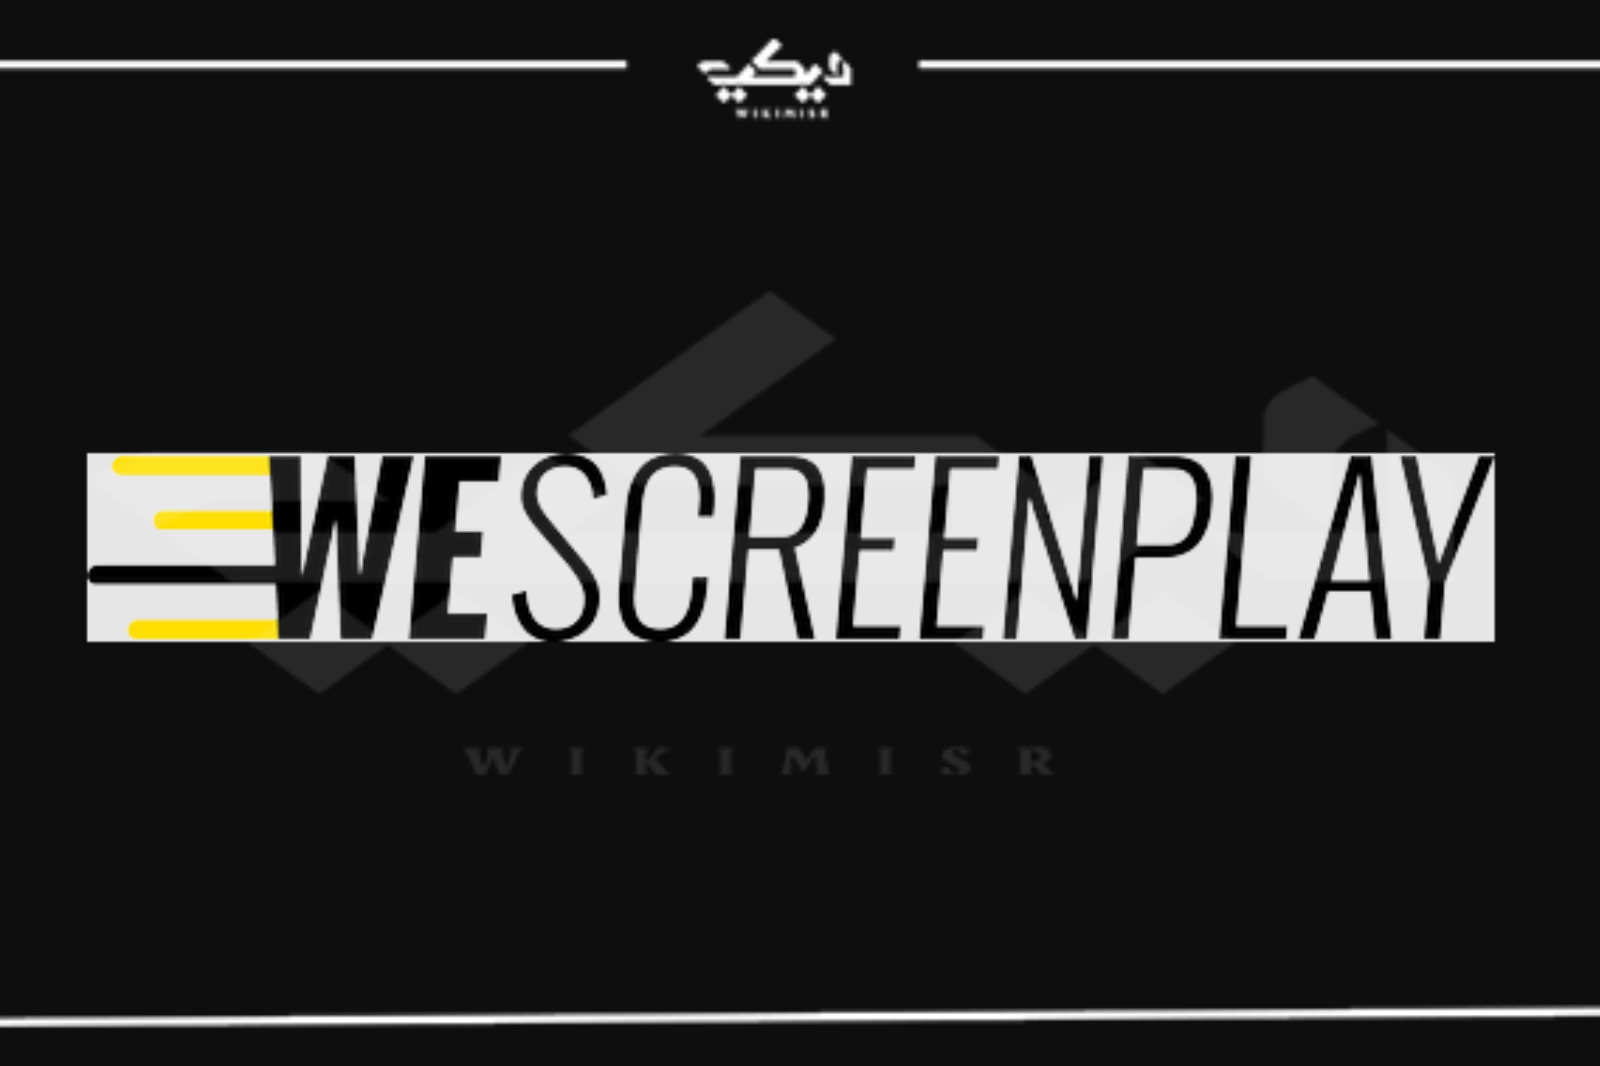 WeScreenplay